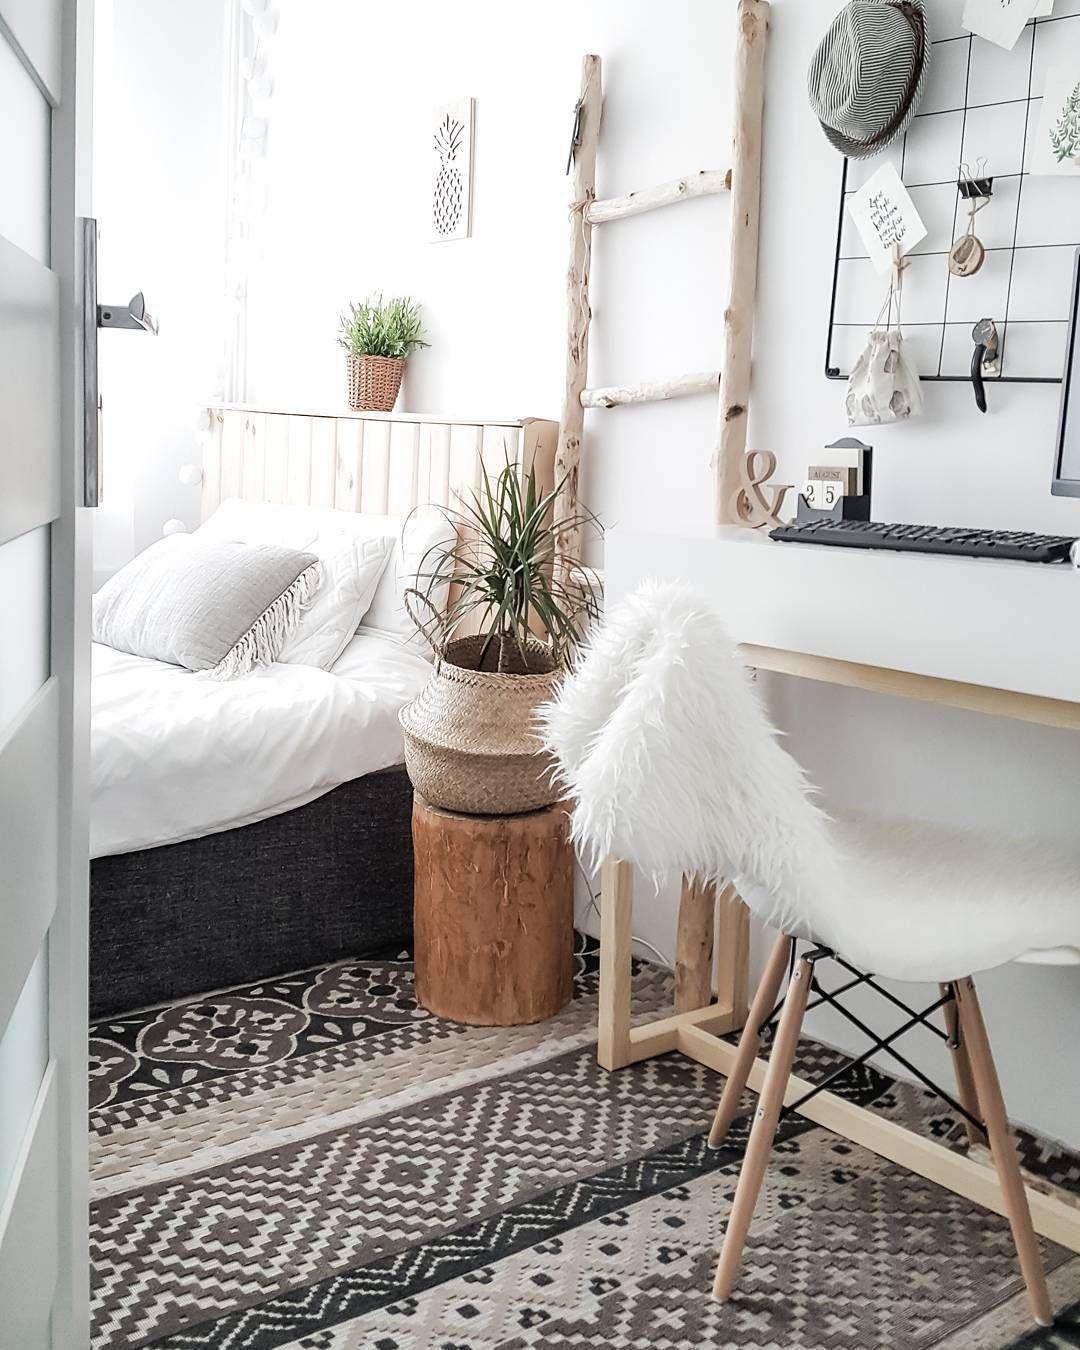 27 Small Bedroom Ideas Design Minimalist And Simple Dekor Ev Dekorasyonu Yatak Basi